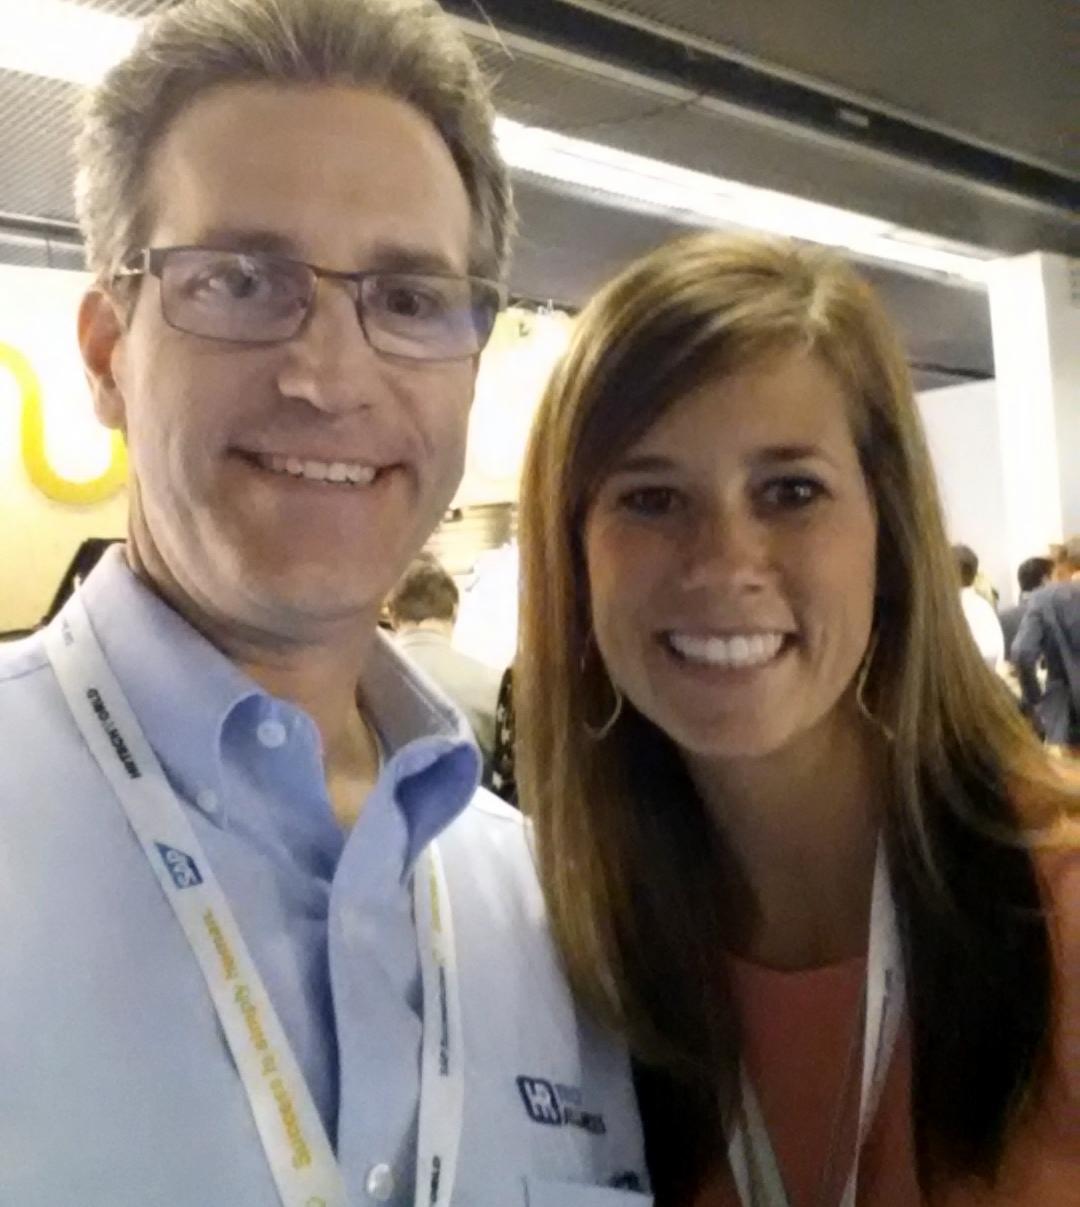 Ward @HRTechAdvisor & Lauren @HireVue selfie at #HRTechWorld #HRTech